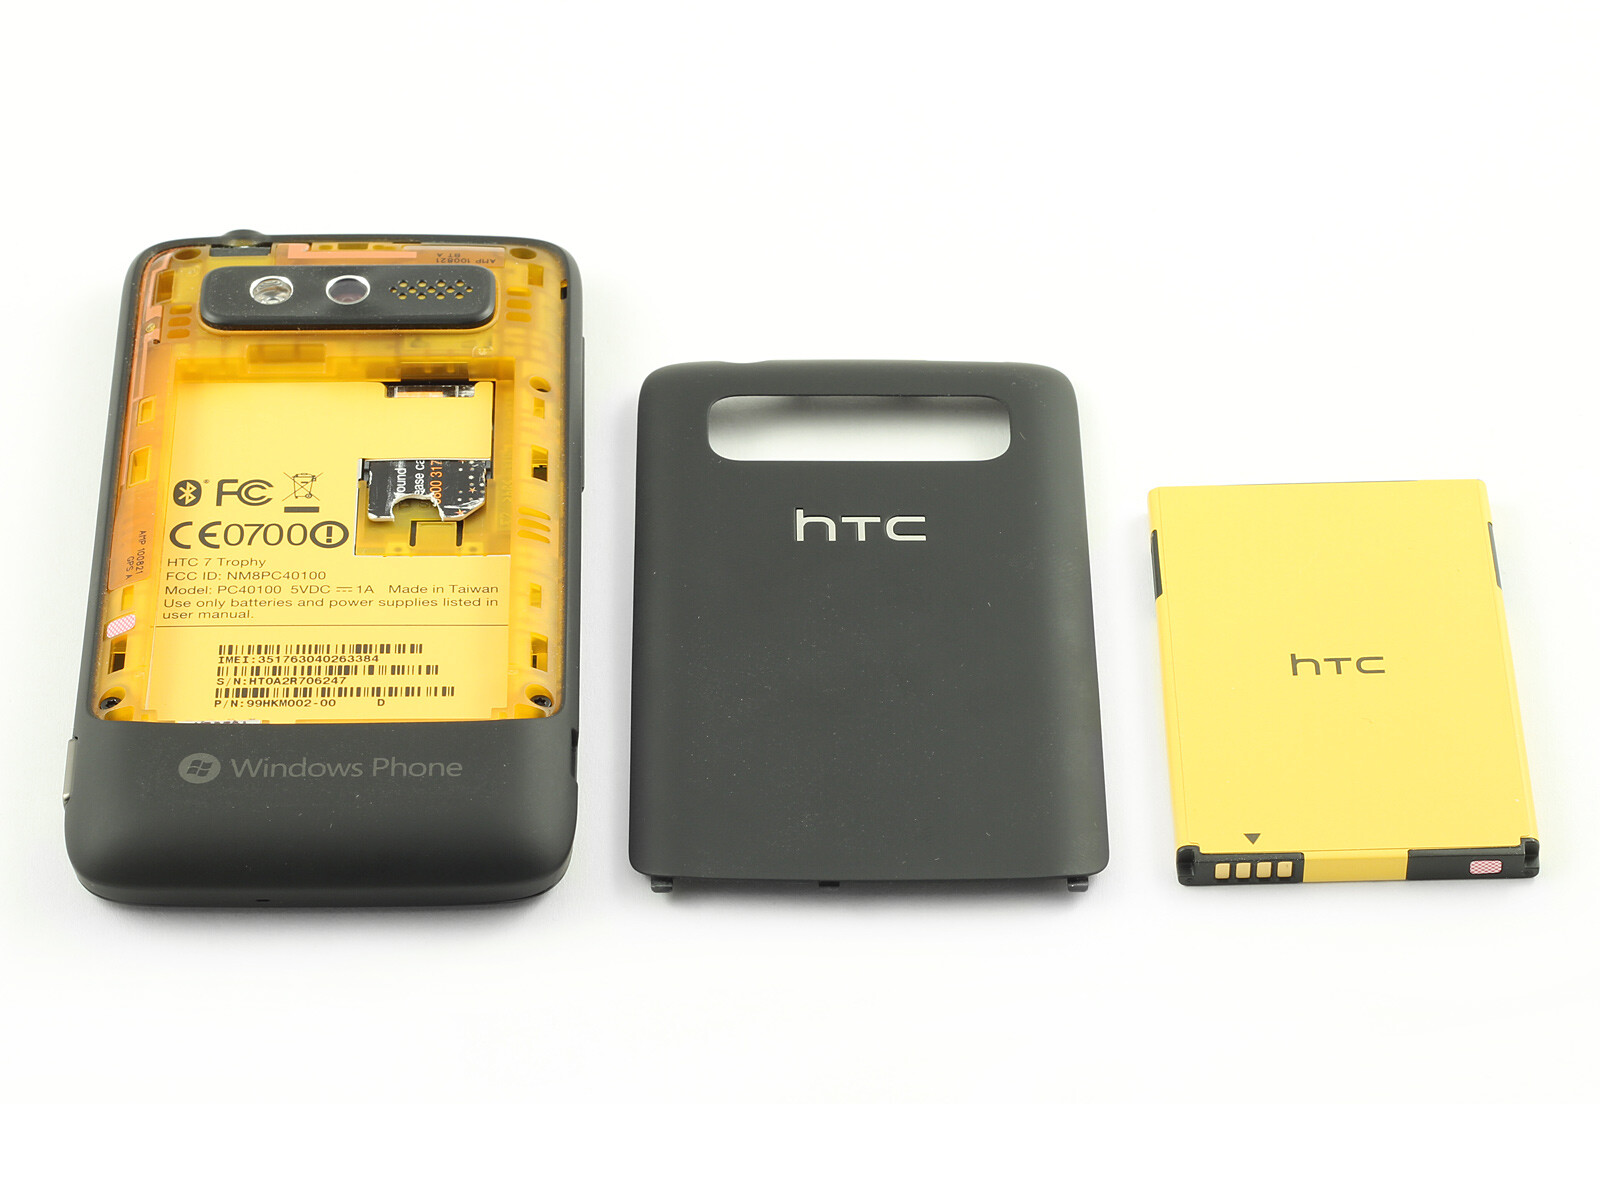 htc 7 trophy manual various owner manual guide u2022 rh justk co Nokia Lumia 710 Samsung Focus